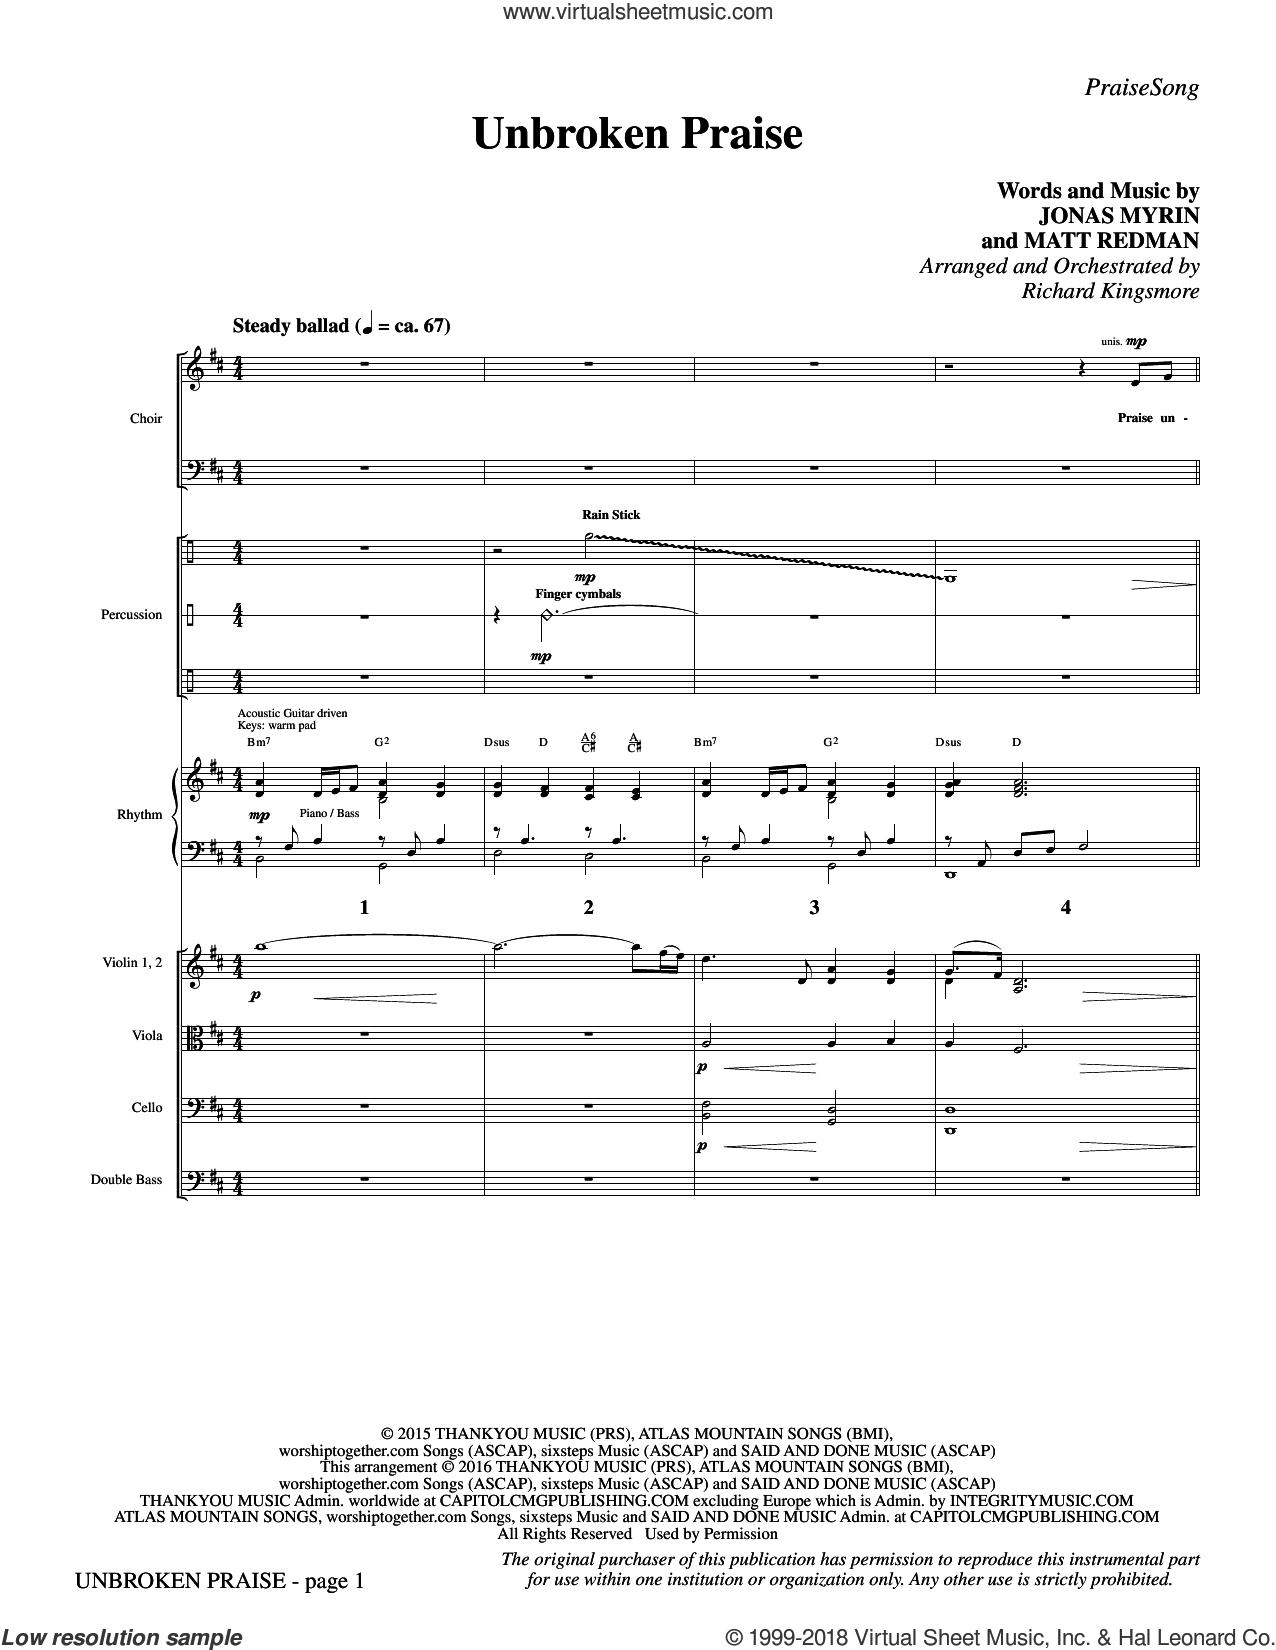 Unbroken Praise (COMPLETE) sheet music for orchestra/band by Matt Redman, Jonas Myrin and Richard Kingsmore, intermediate skill level